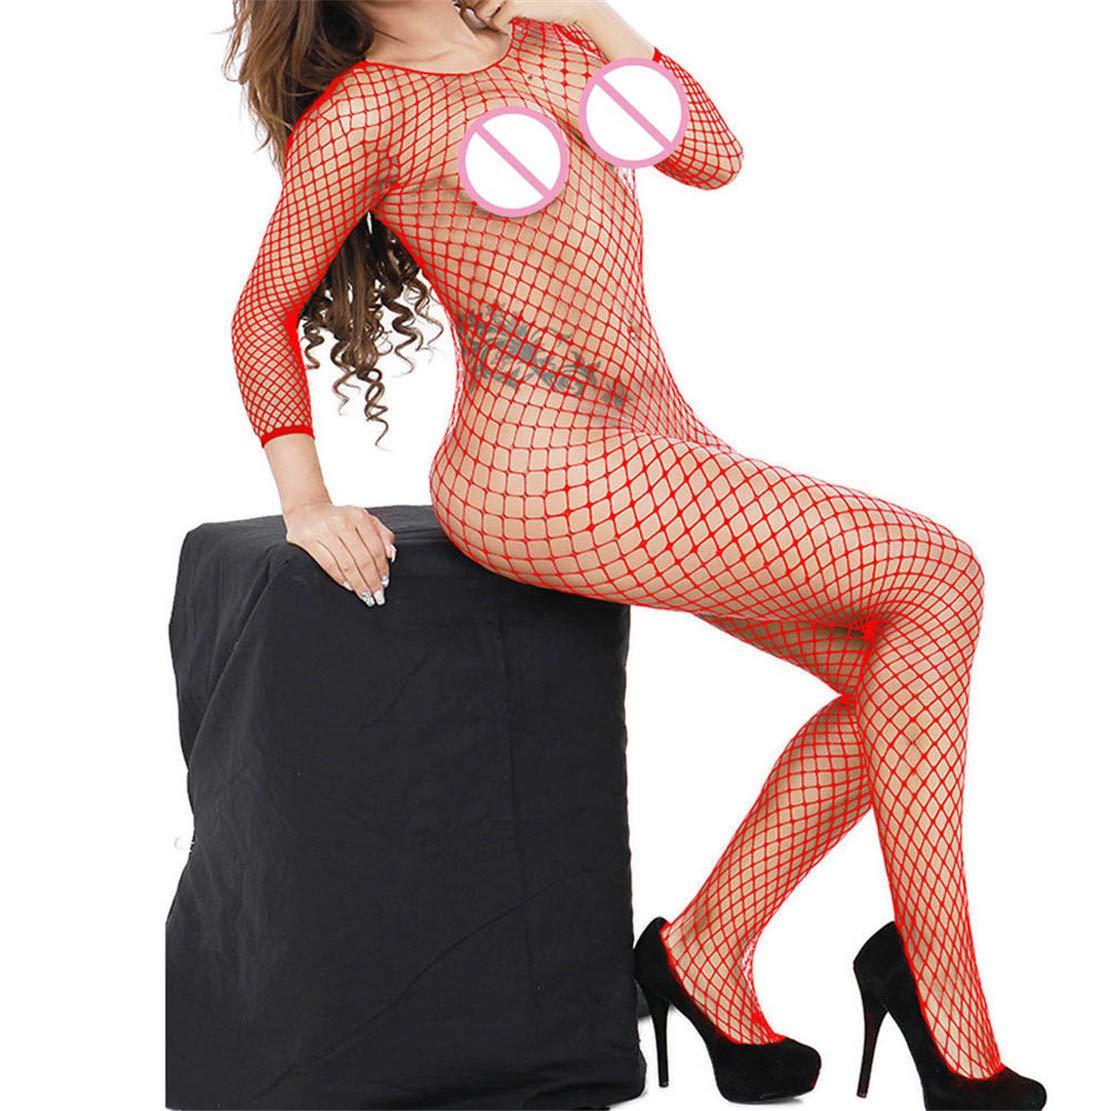 Bringbring Women's Mesh Sexy Lingerie Babydoll Free Size Bodysuit